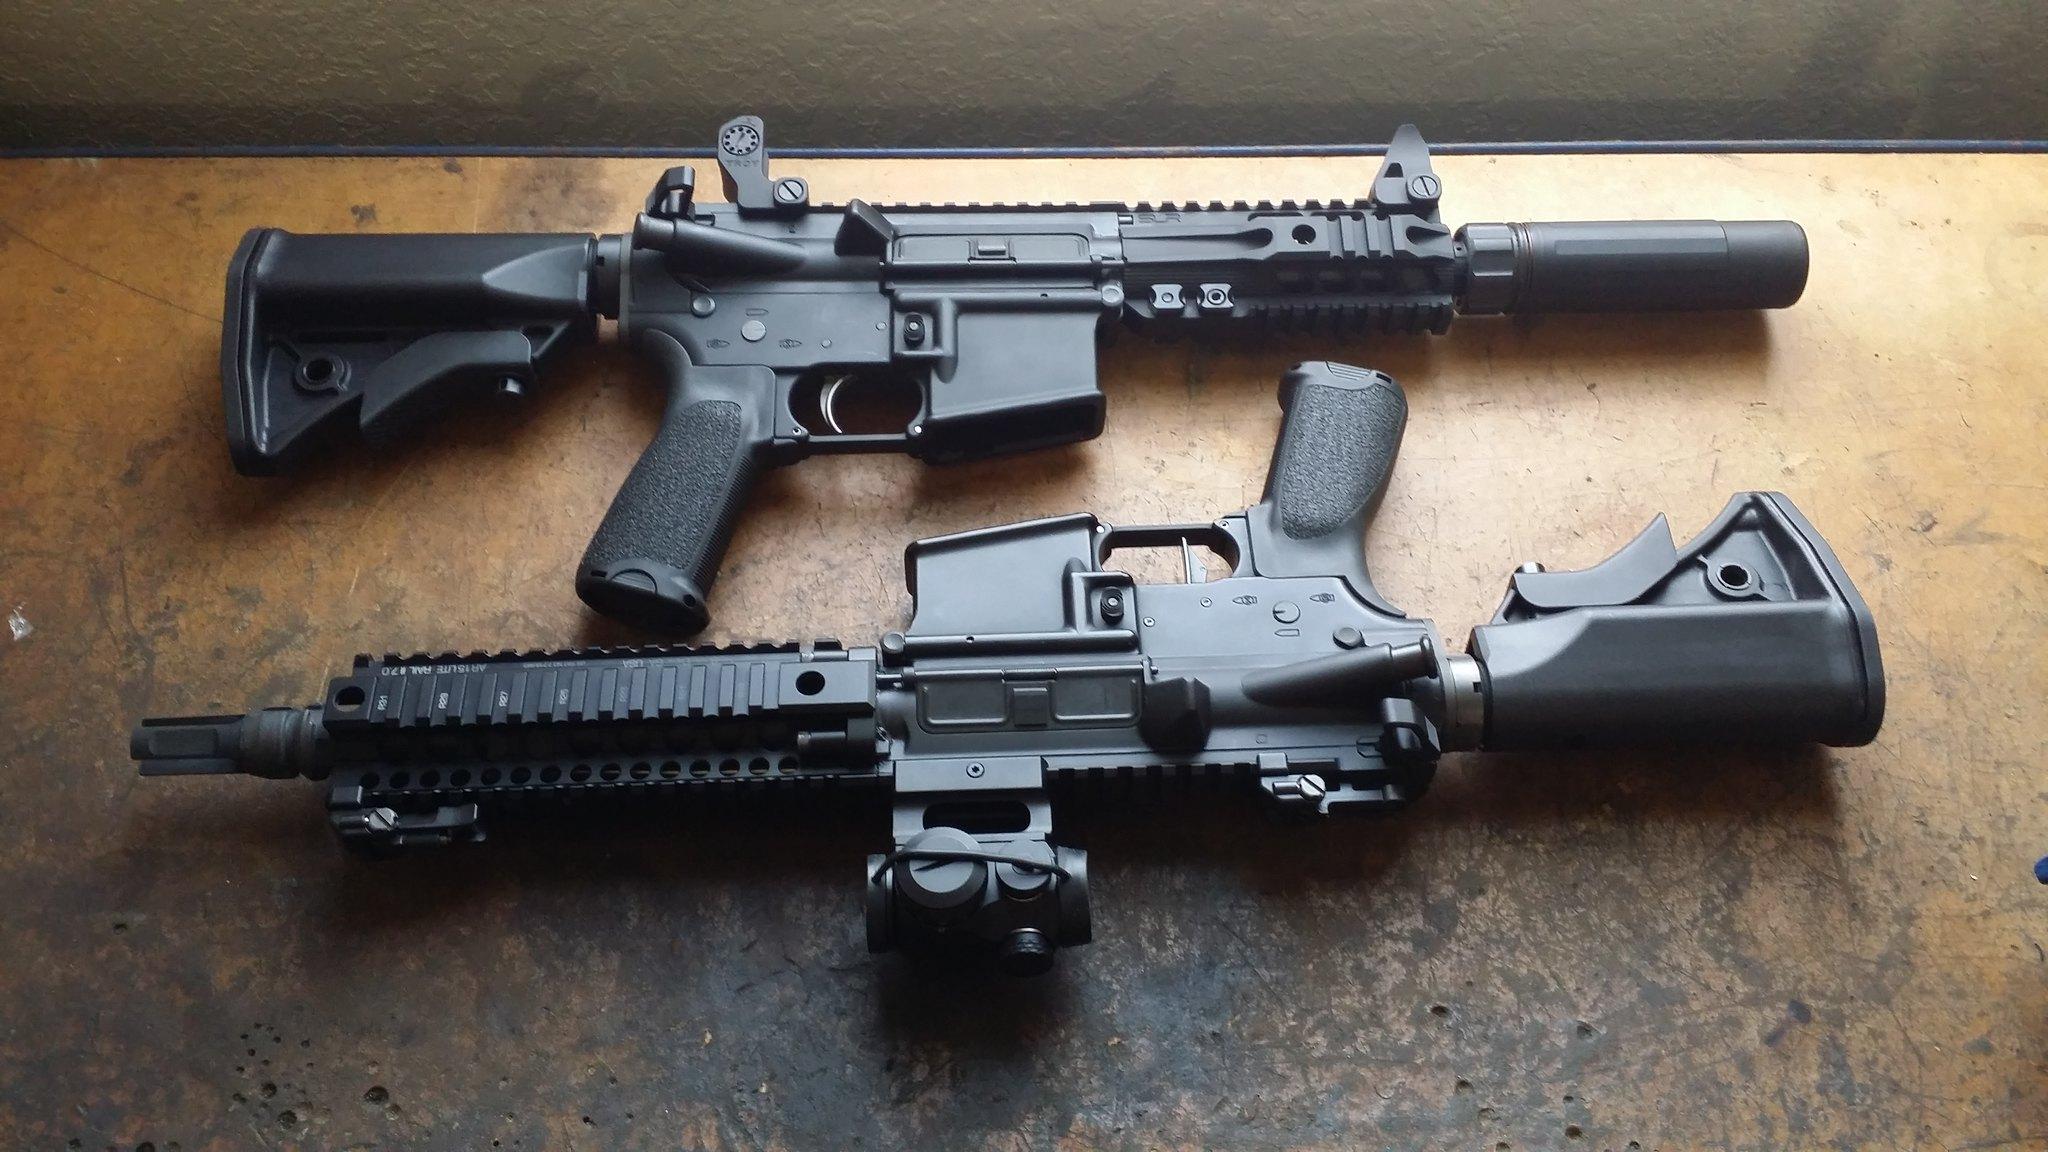 shortest useful AR SBR? - AR15 COM